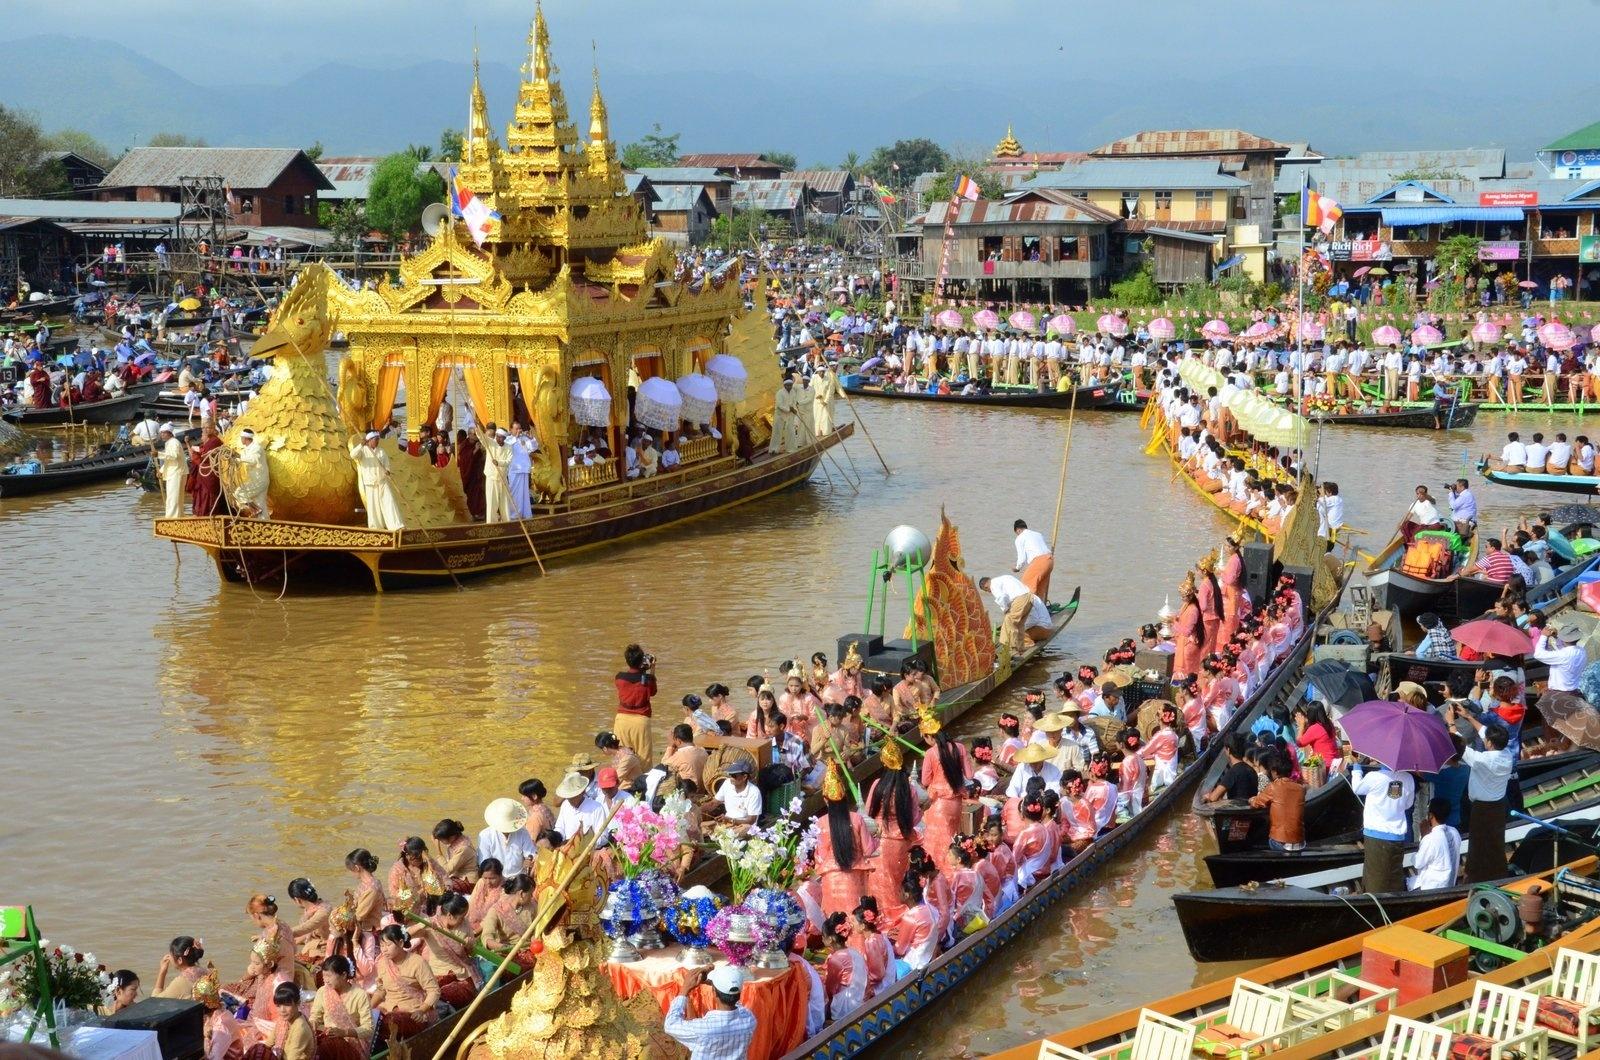 Amazing Boat Race in Asia